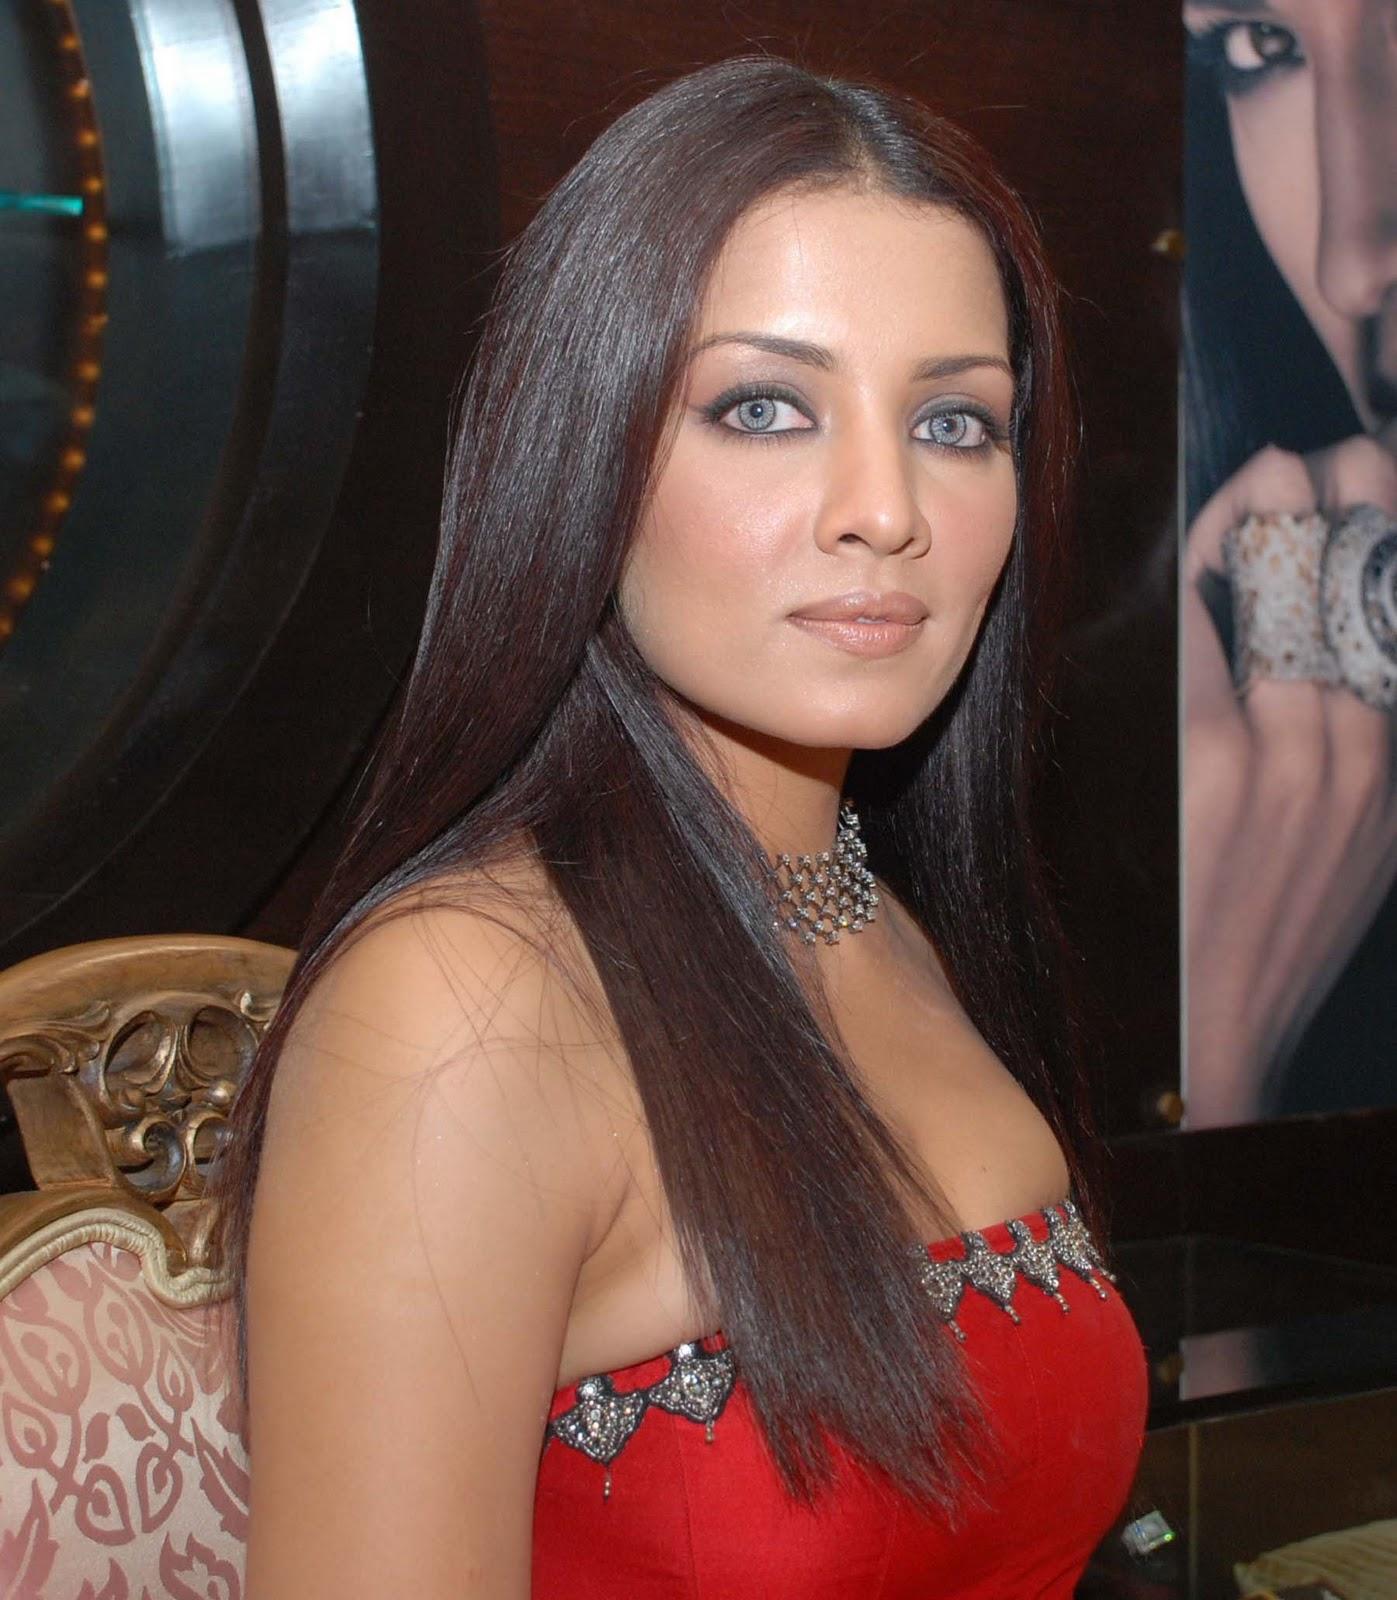 Watch Mona Singh 2003 video